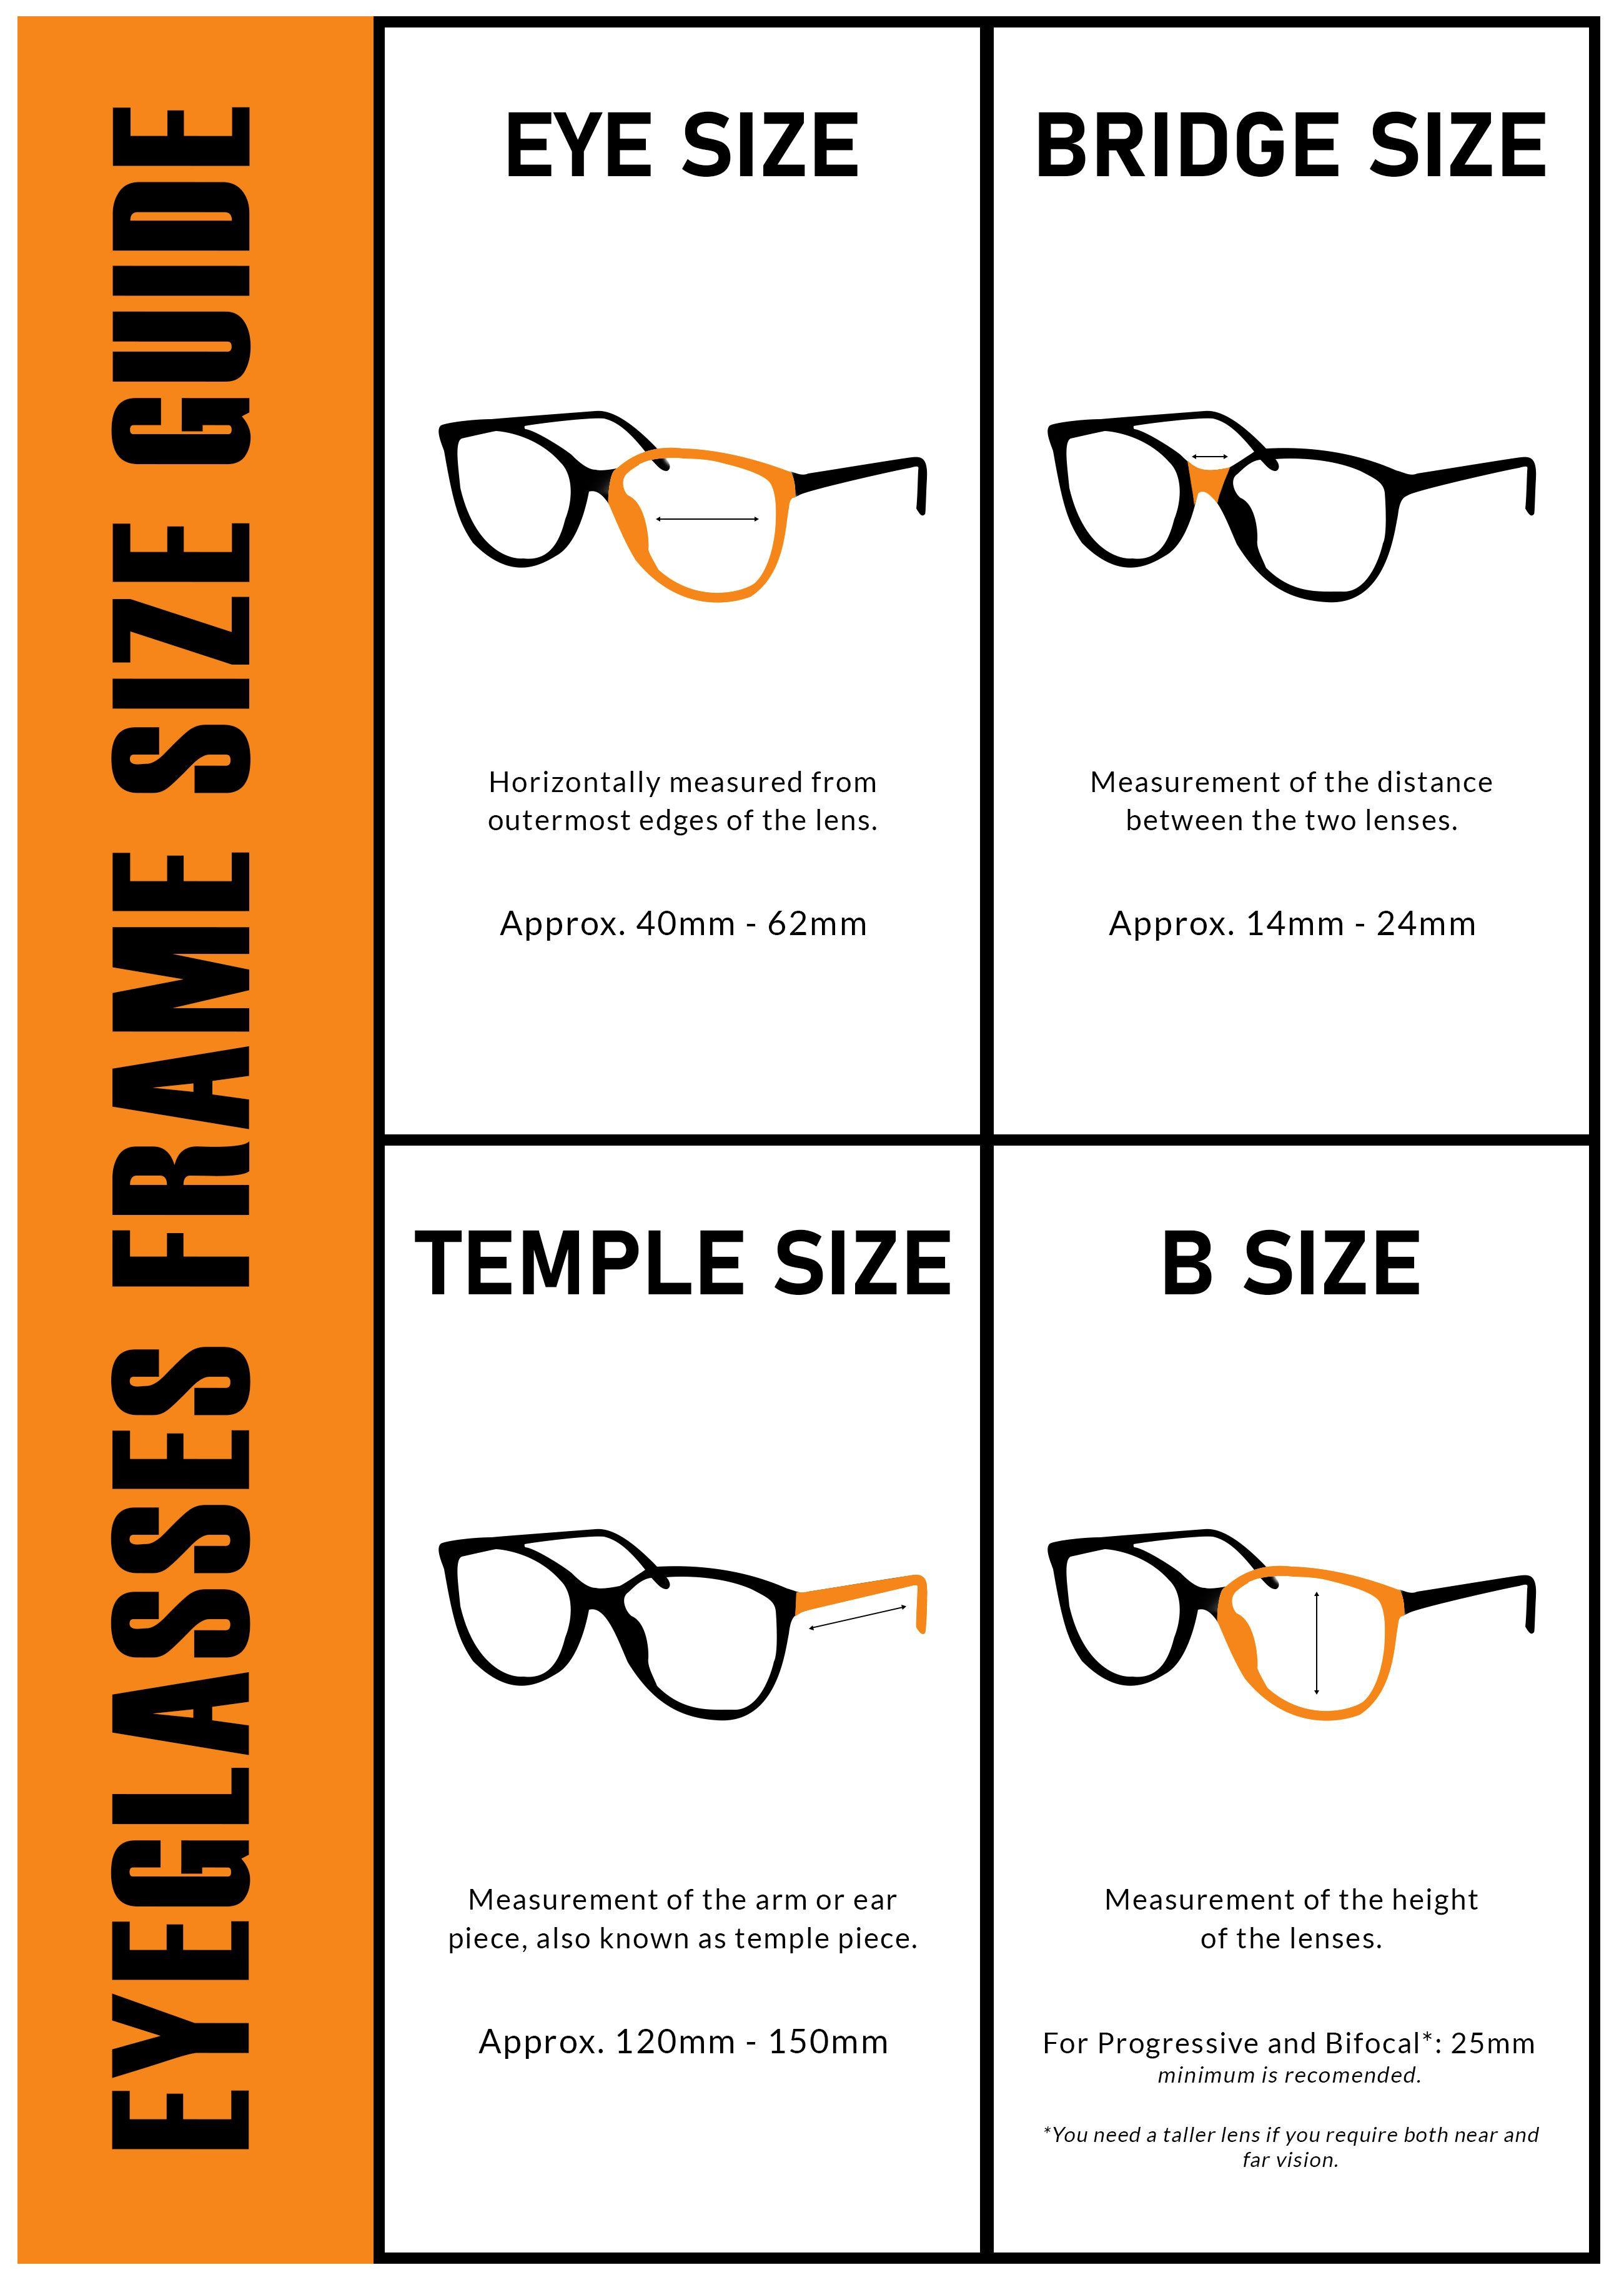 Eyeglasses frame size guide eyeglasses eyeglasses